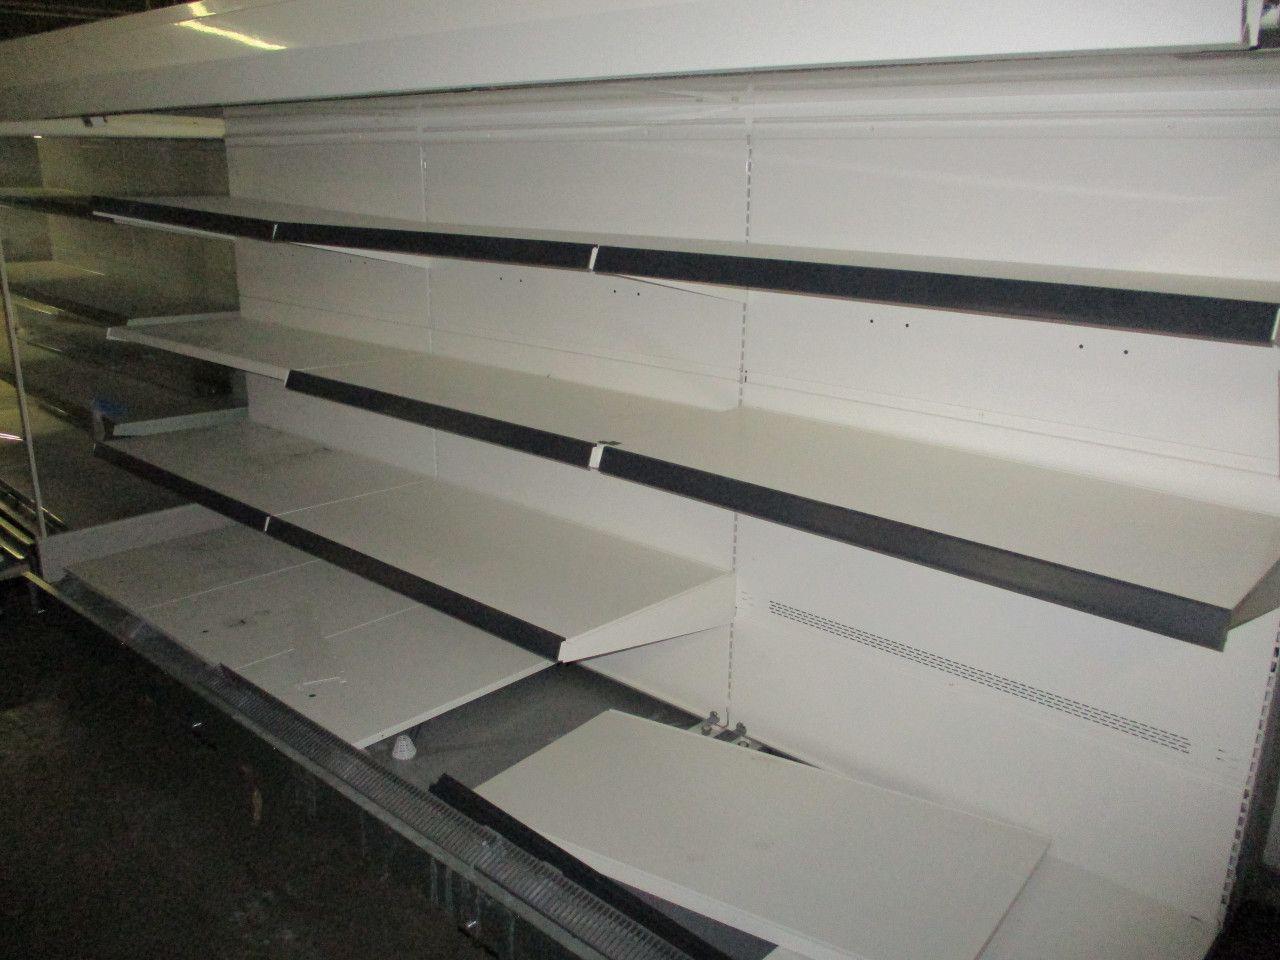 AHT Vento 375 L8 M1 Standkühler